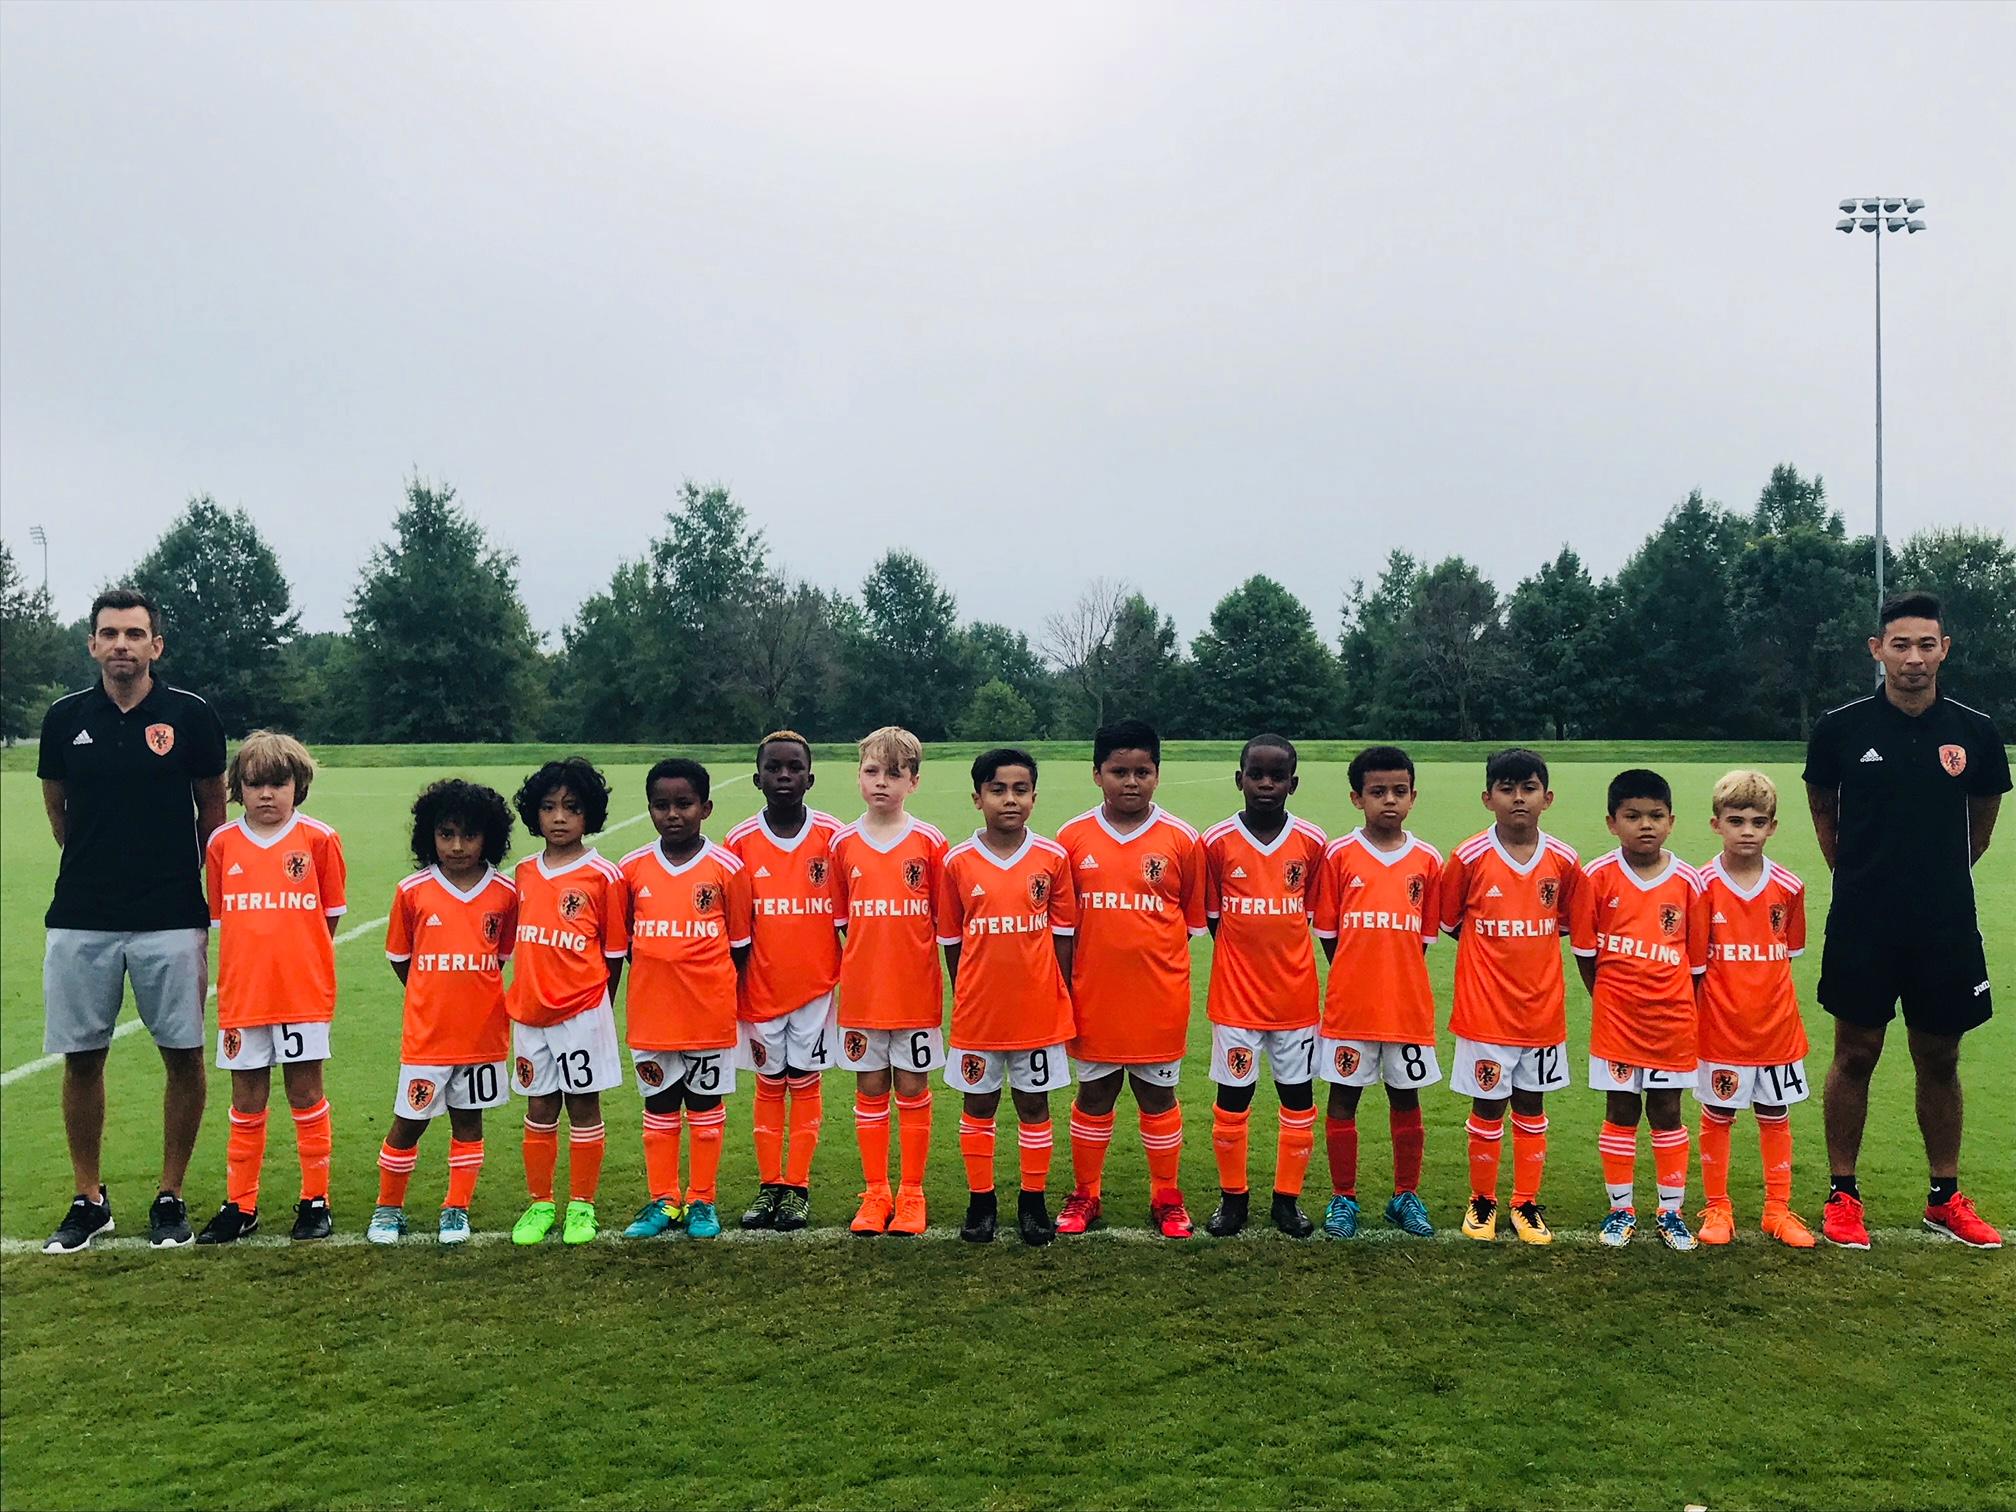 Sterling Soccer Club 3.JPG